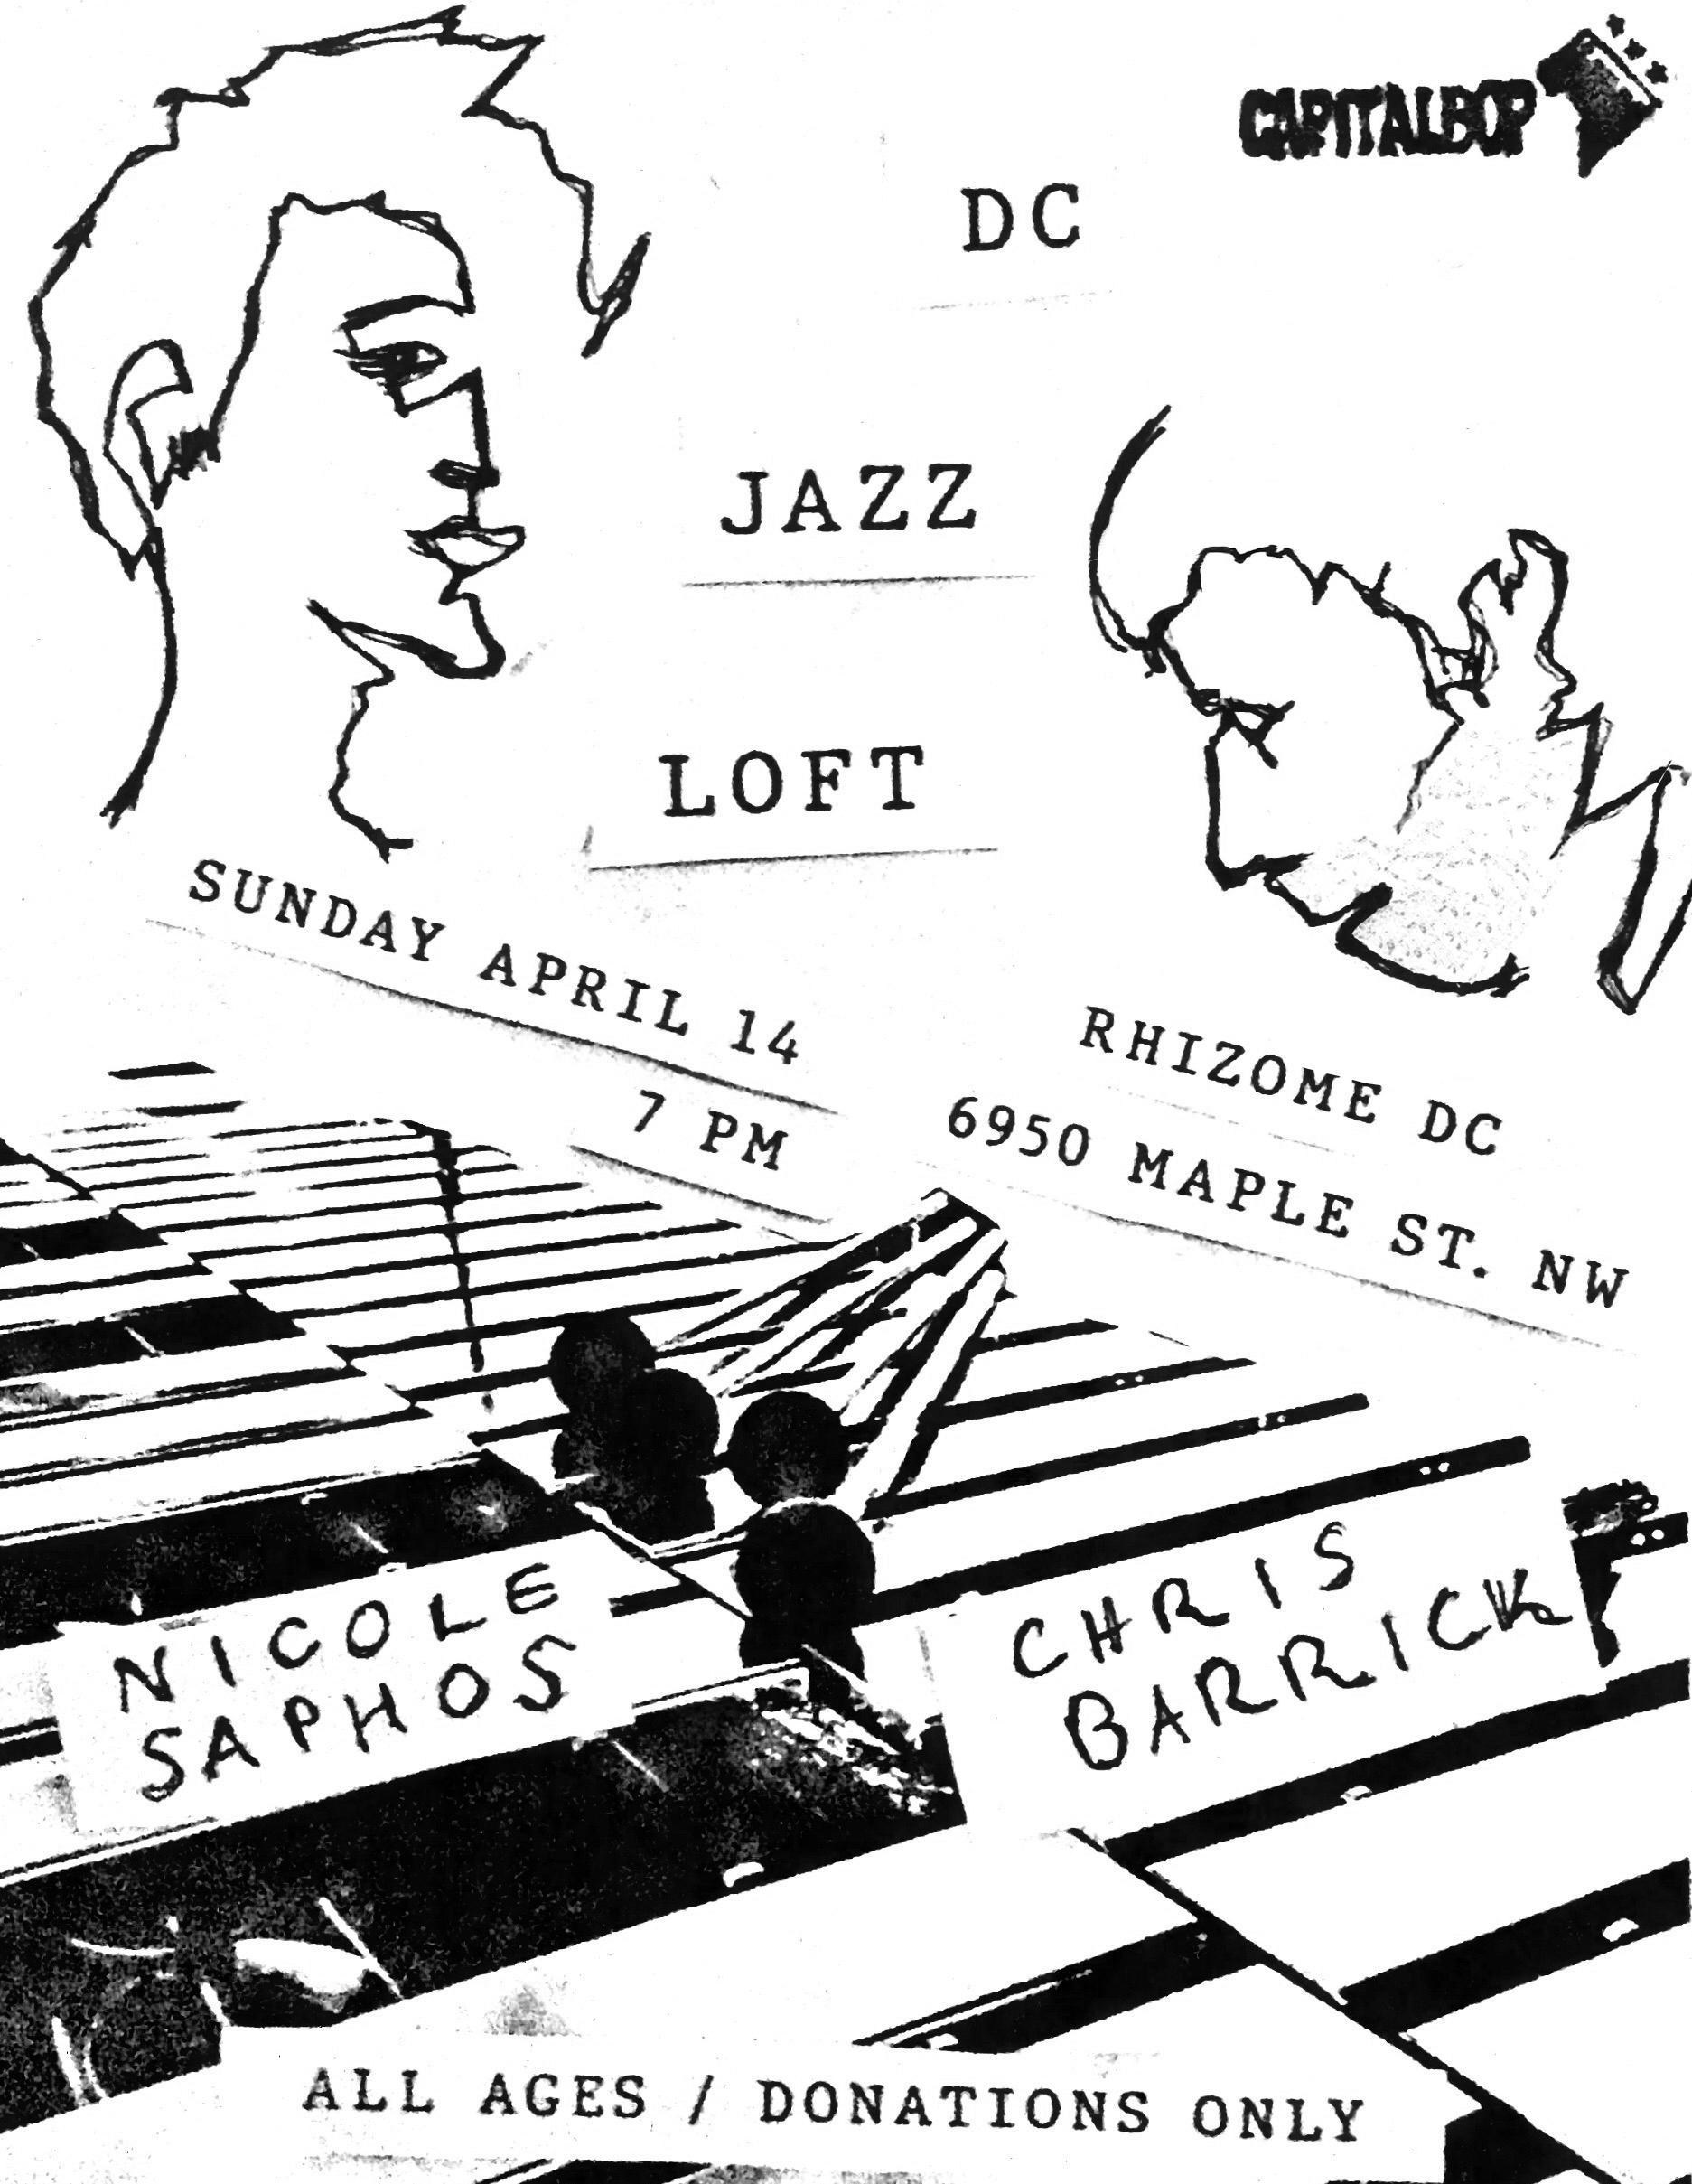 190414-Barrick-Saphos-Poster-web.jpg